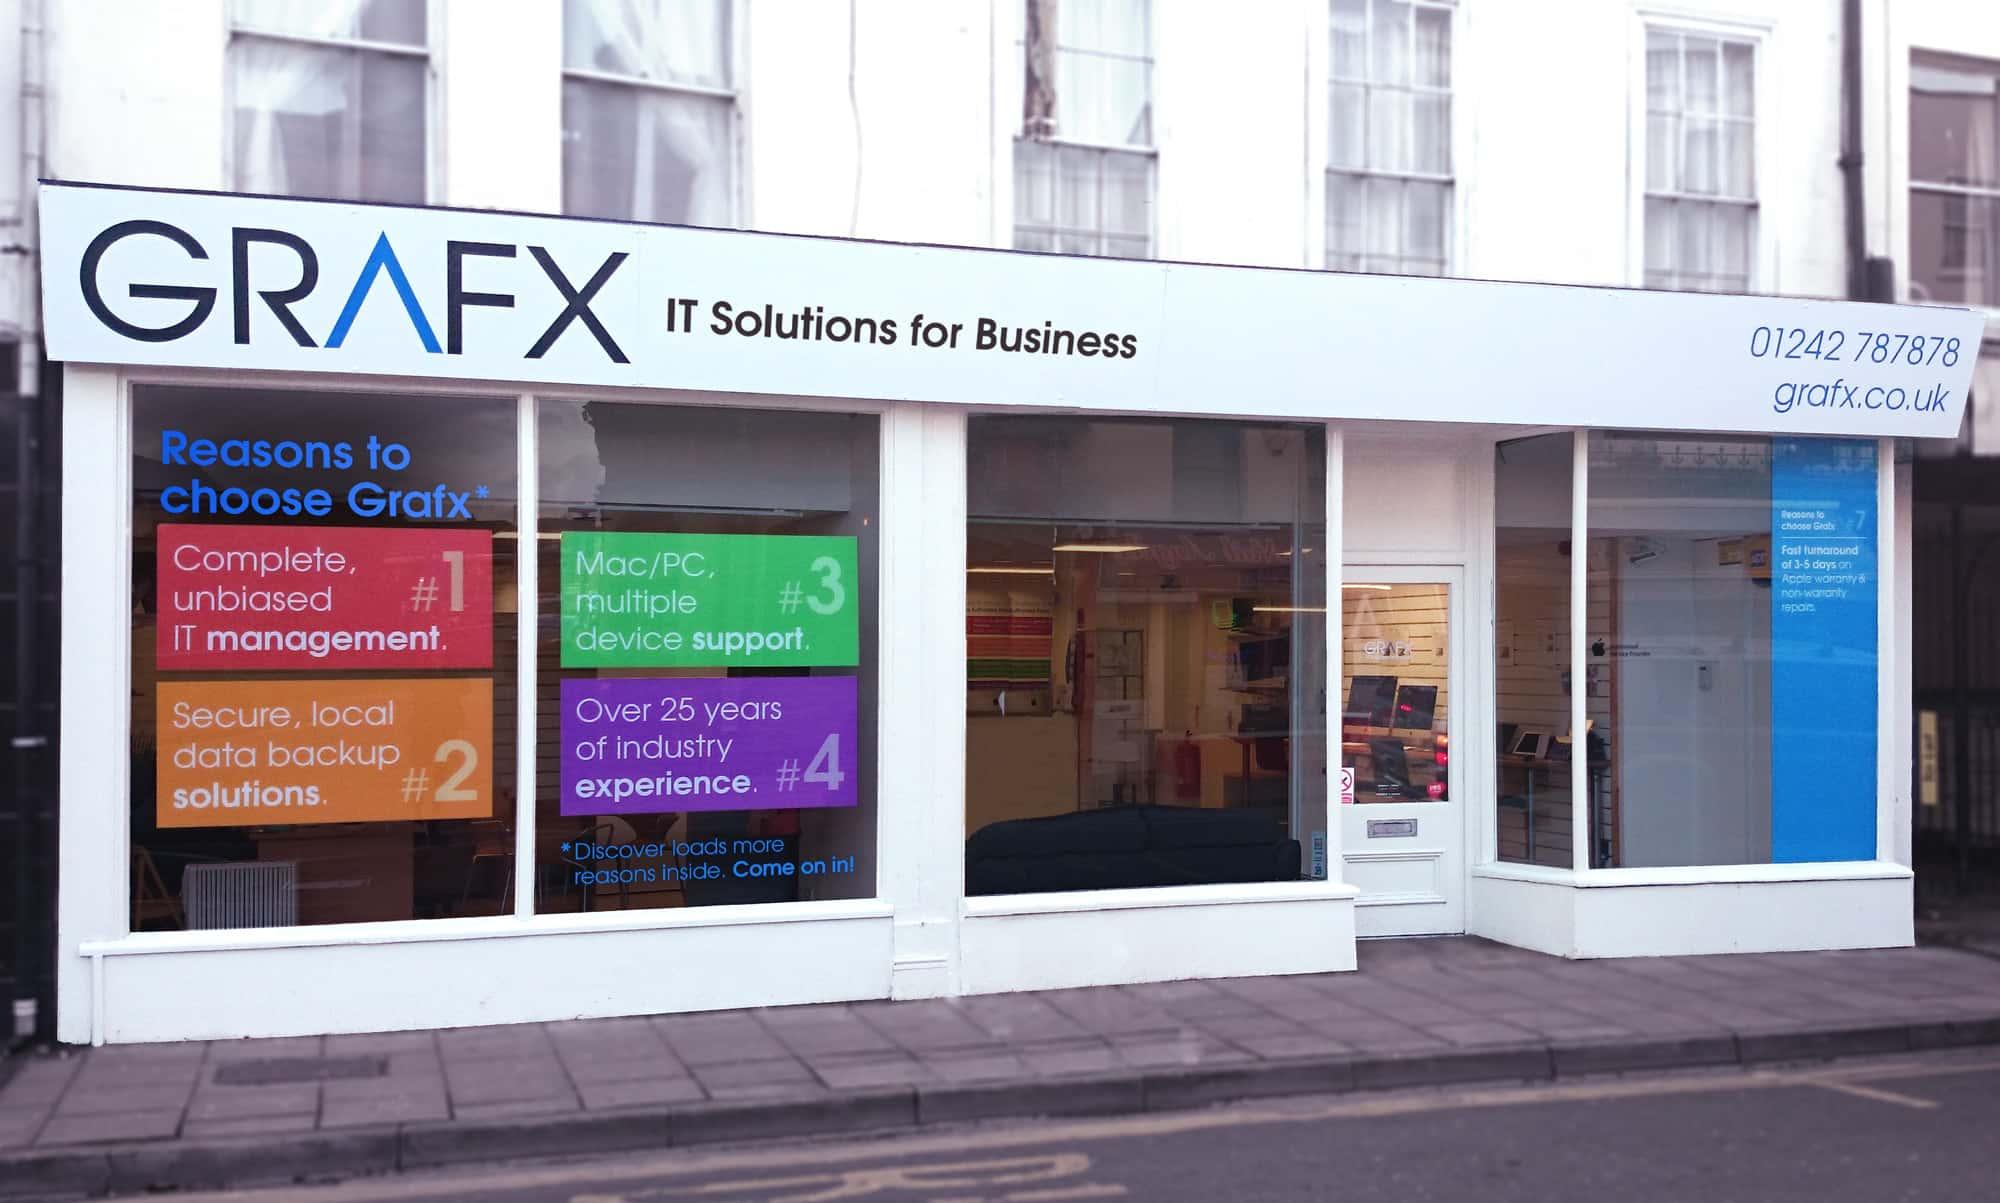 Grafx external signage